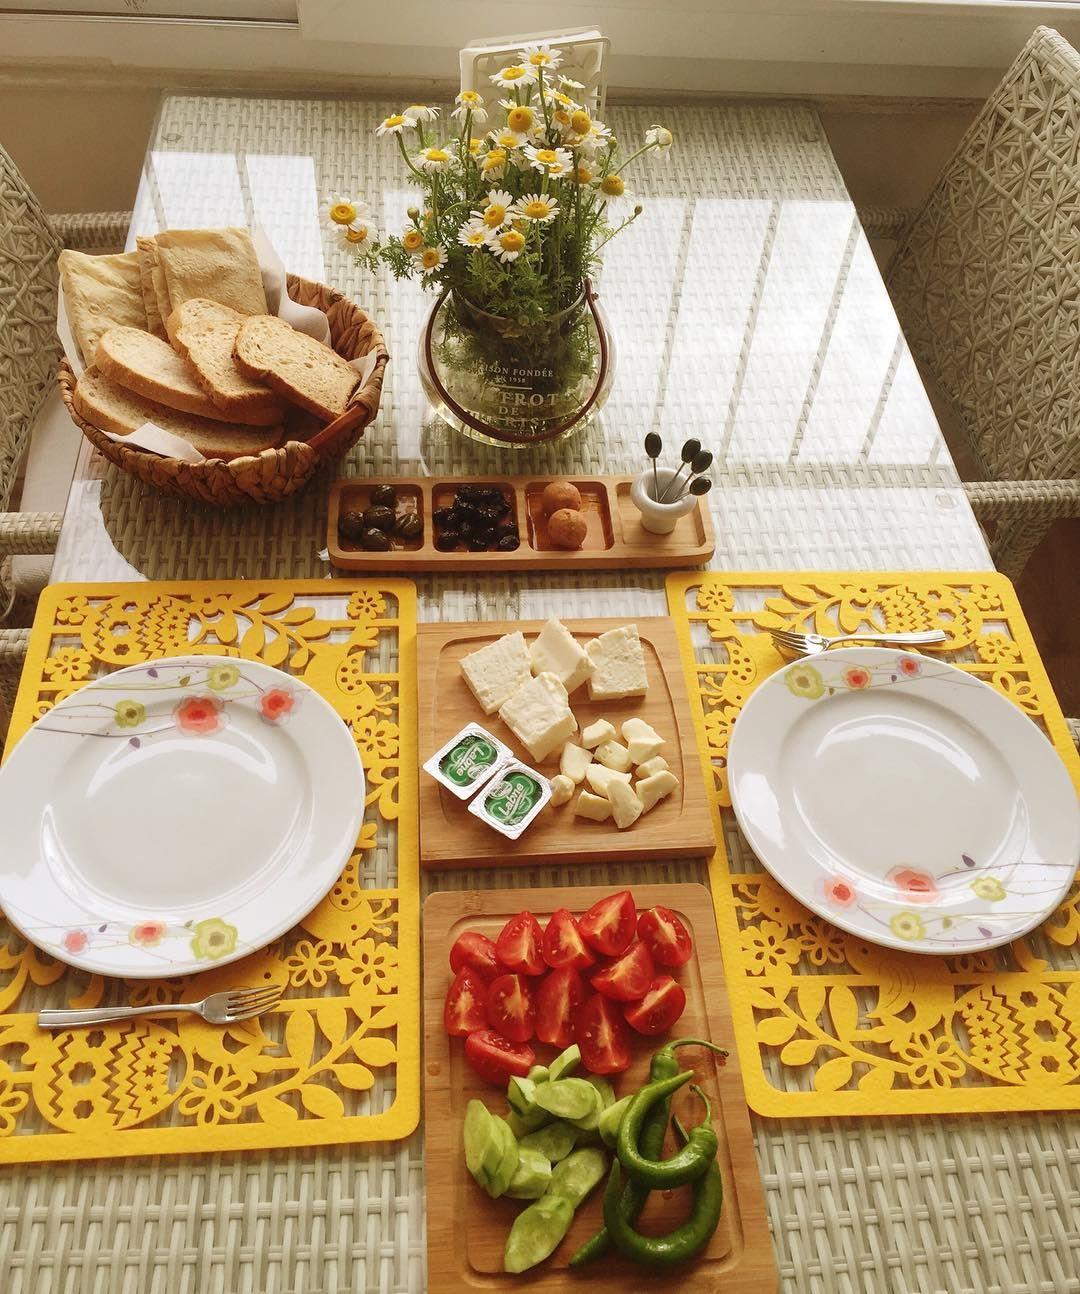 Mutlu pazarlar #happysunday #daisy #home#homedesign#design#homestyle#dekorasyon#evdekor#interiør#interior#inspirasjon#interior123#interior4you#instainterior#interiorforinspo#interiormagasinet#ikea#iskandinav#nordicdesign#white#scandic#homedecor#homesweethome#mutluyumçünkü by aycaerkam http://discoverdmci.com